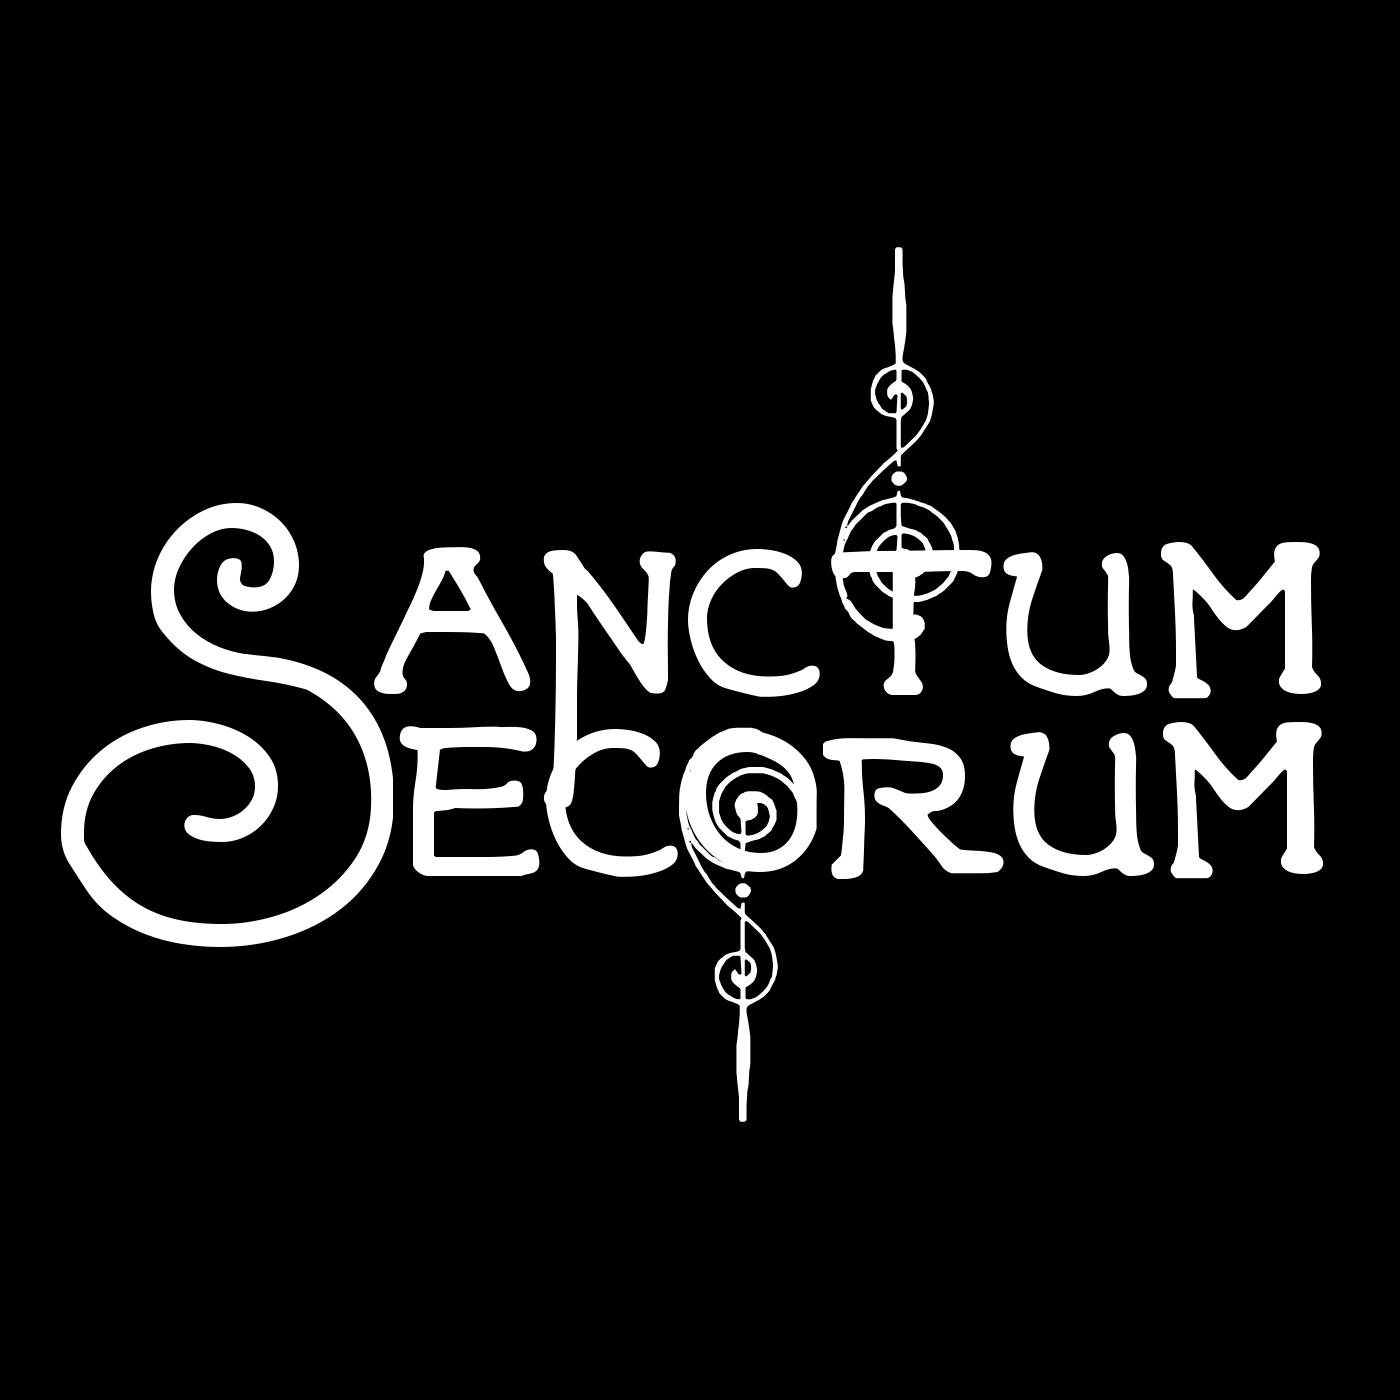 Sanctum Secorum #11 - Another Fine Myth